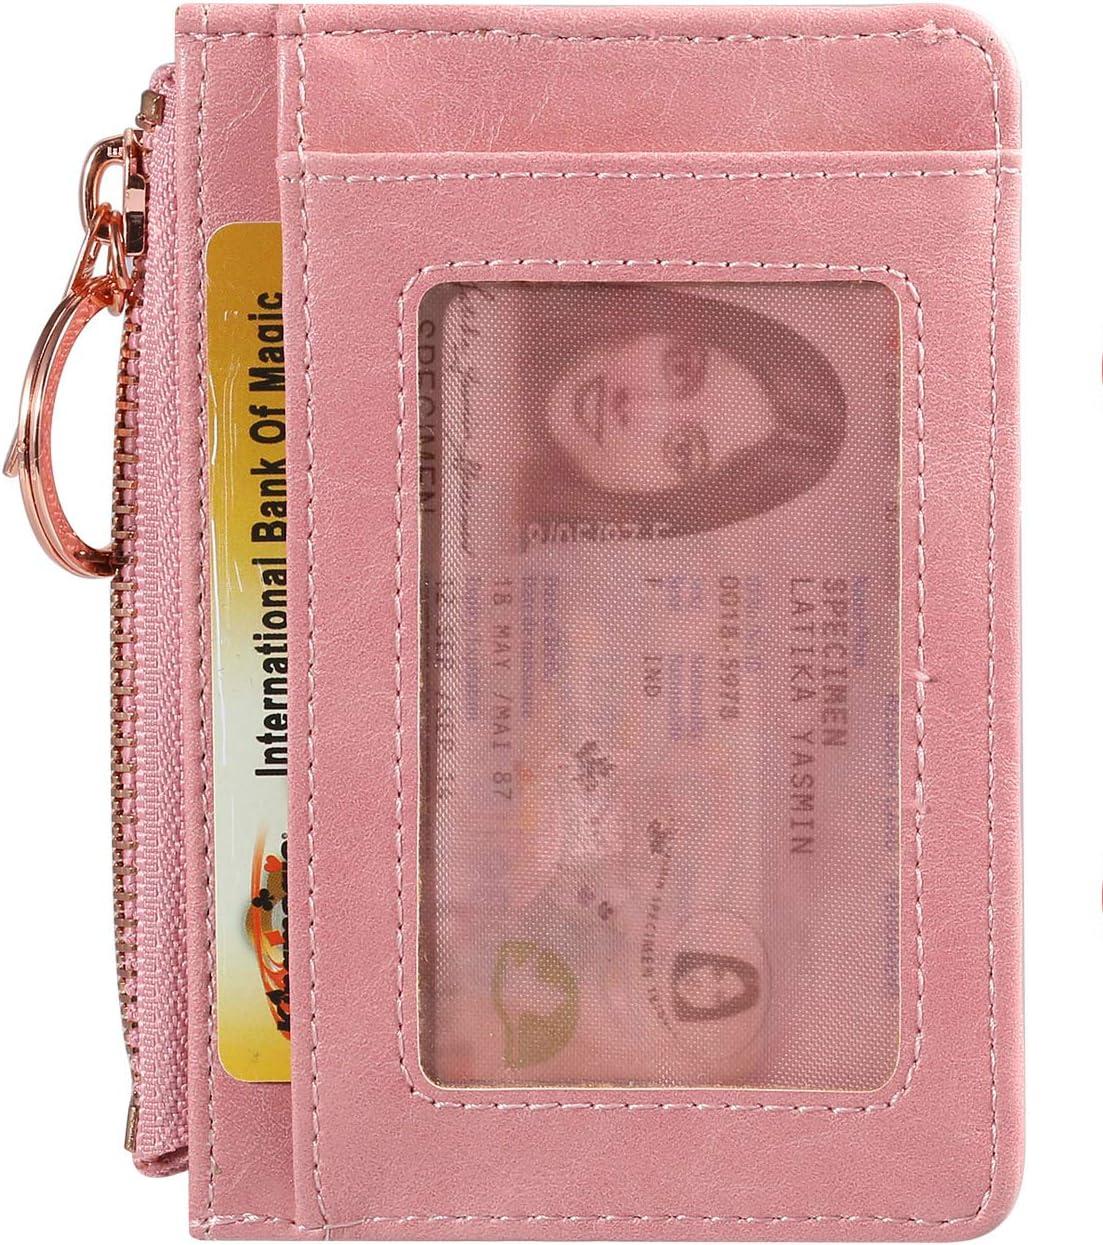 Leather Card Case Holder Front Pocket Wallet Change Purse for Women Girls keychain Beige